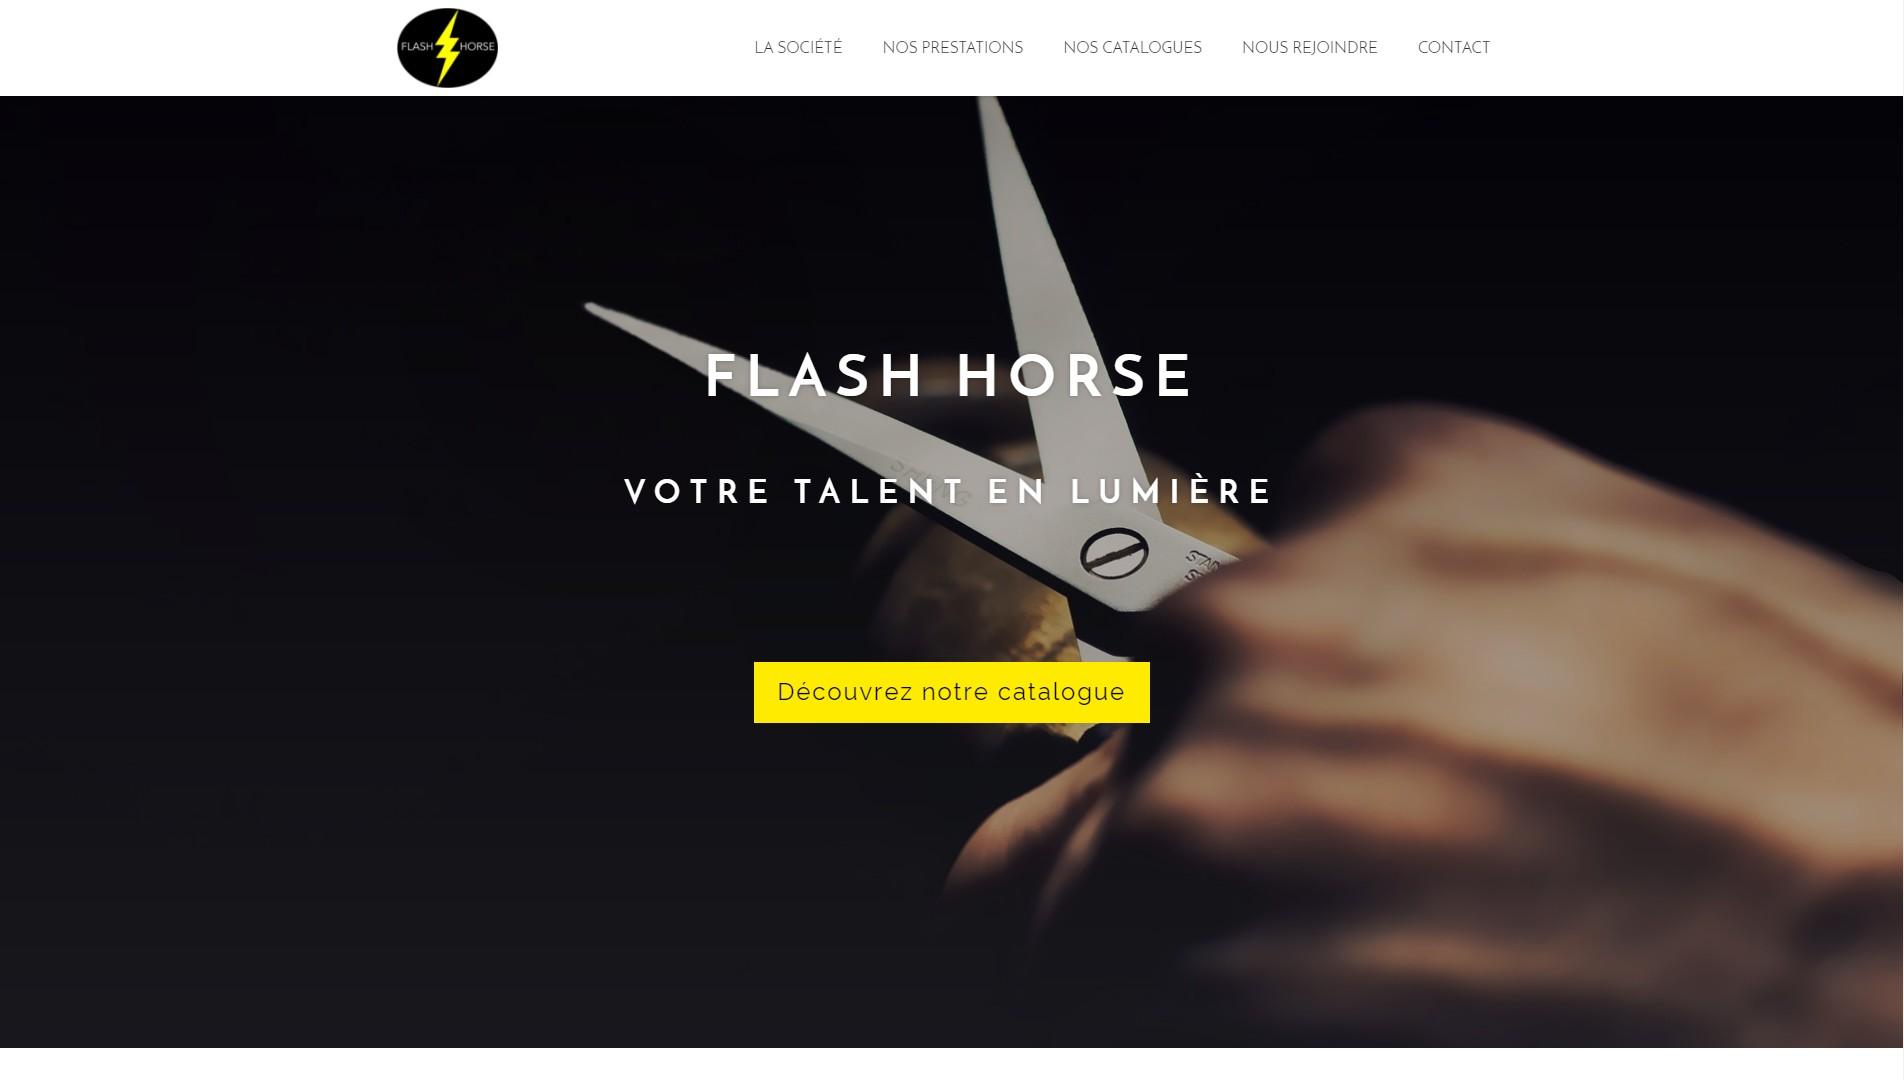 Flash-horse-b-web (1)